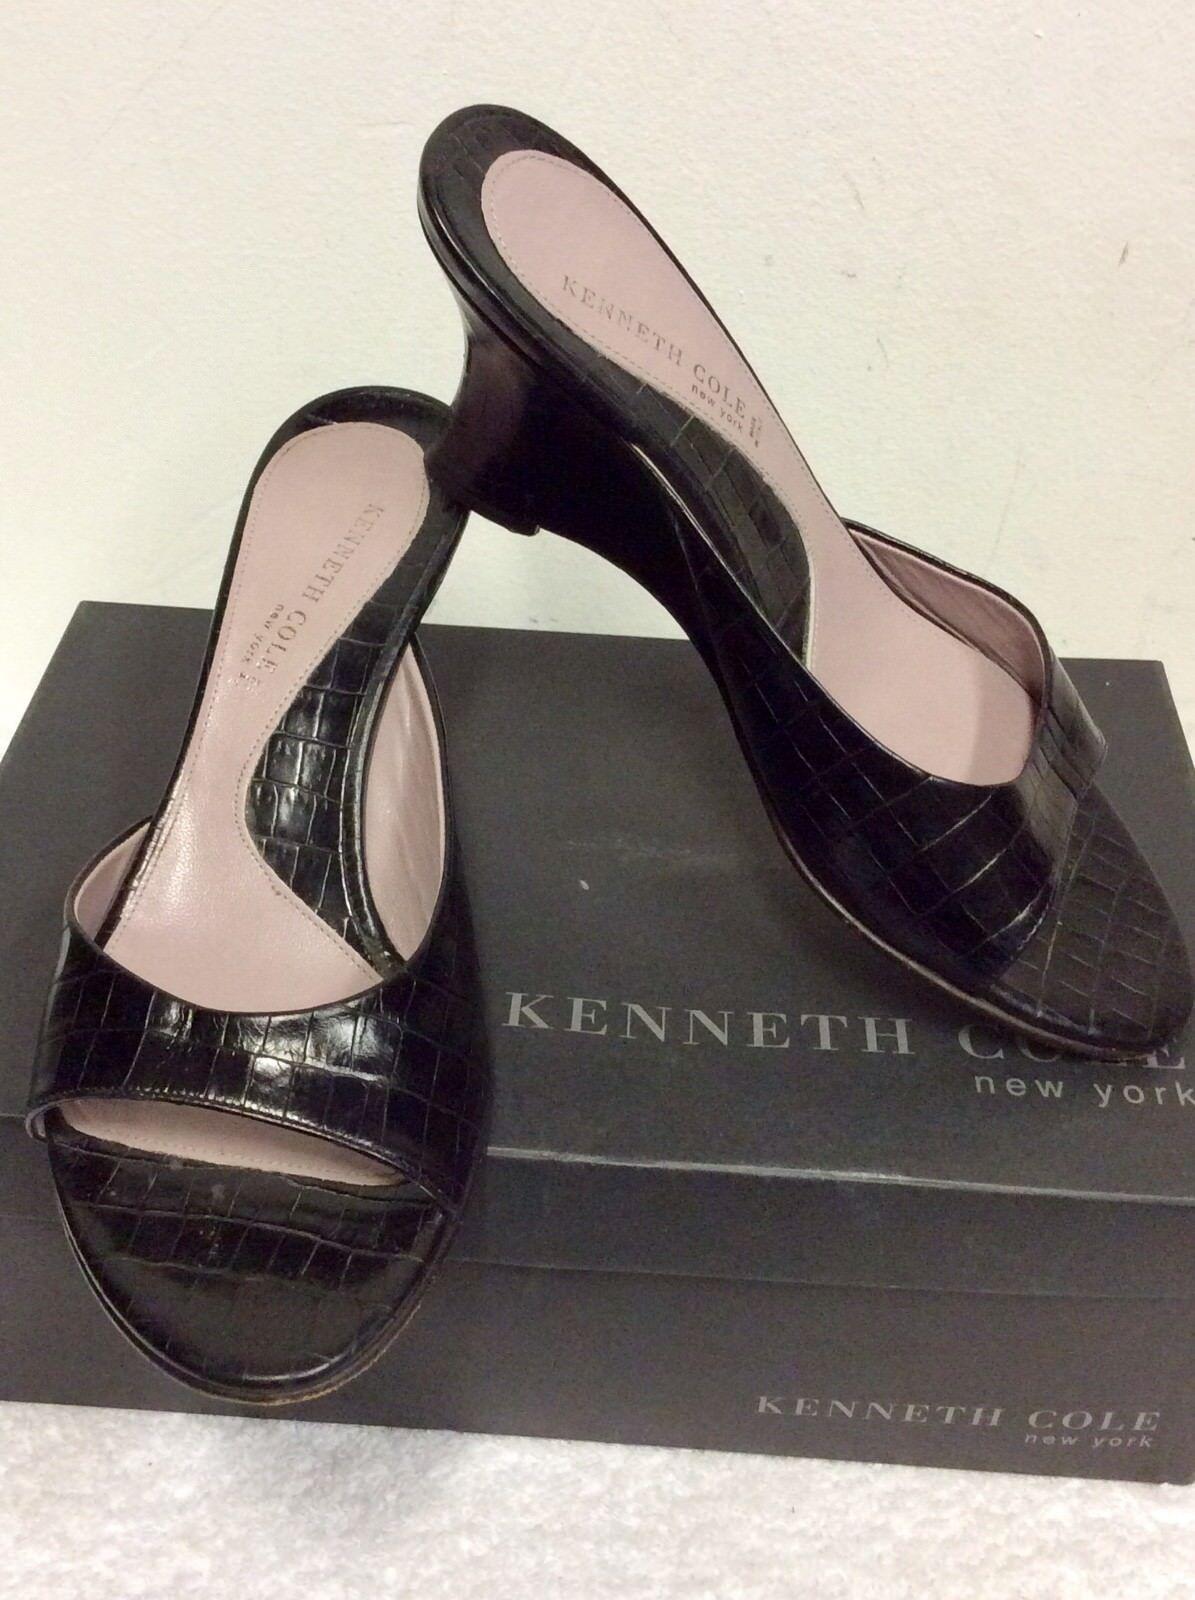 Kenneth Cole nero Leather Peeptoe Zeppa e Tacco Tacco Tacco Muli Taglia 5 38 costo .00 3b46e4